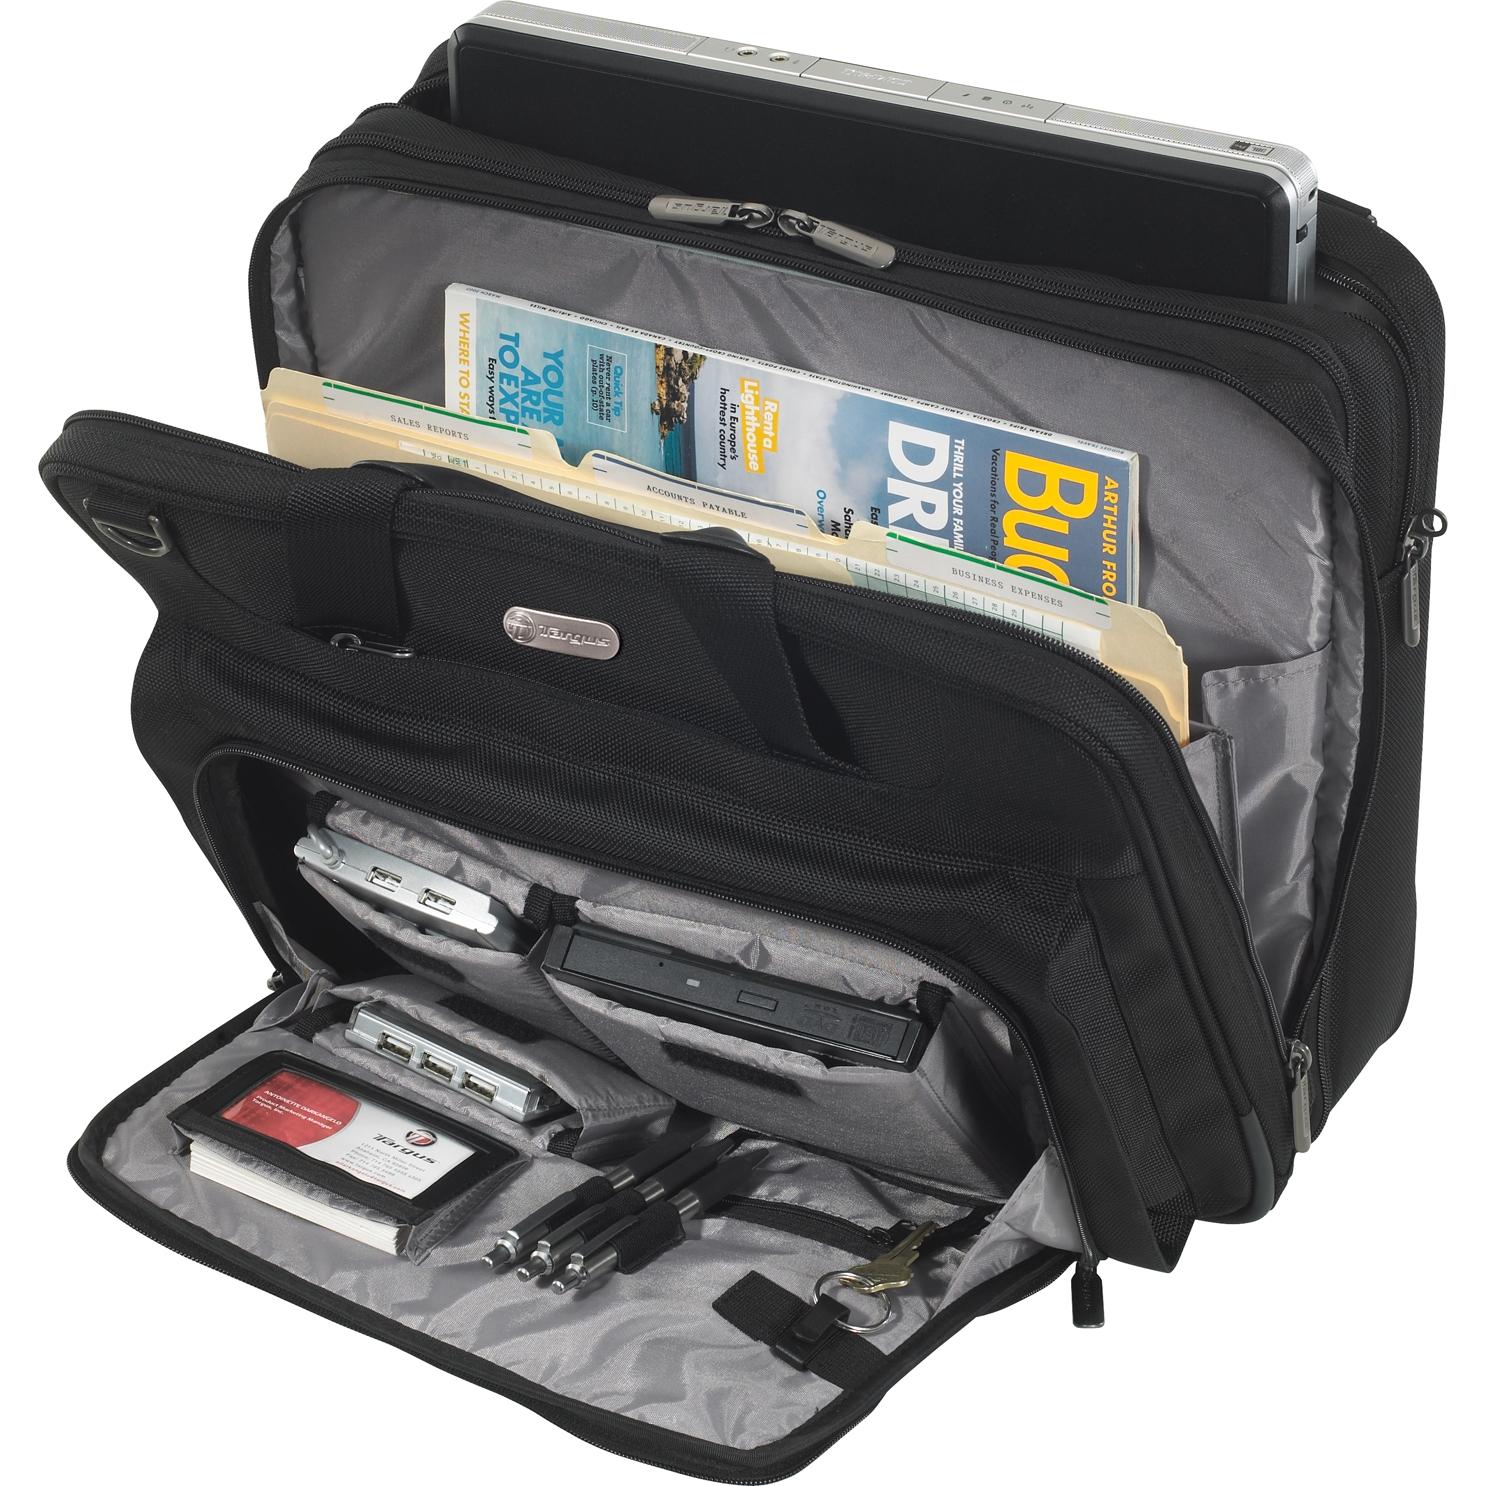 15 6 Checkpoint Friendly Air Traveler Laptop Case Tbt04401us Black Briefcases Targus